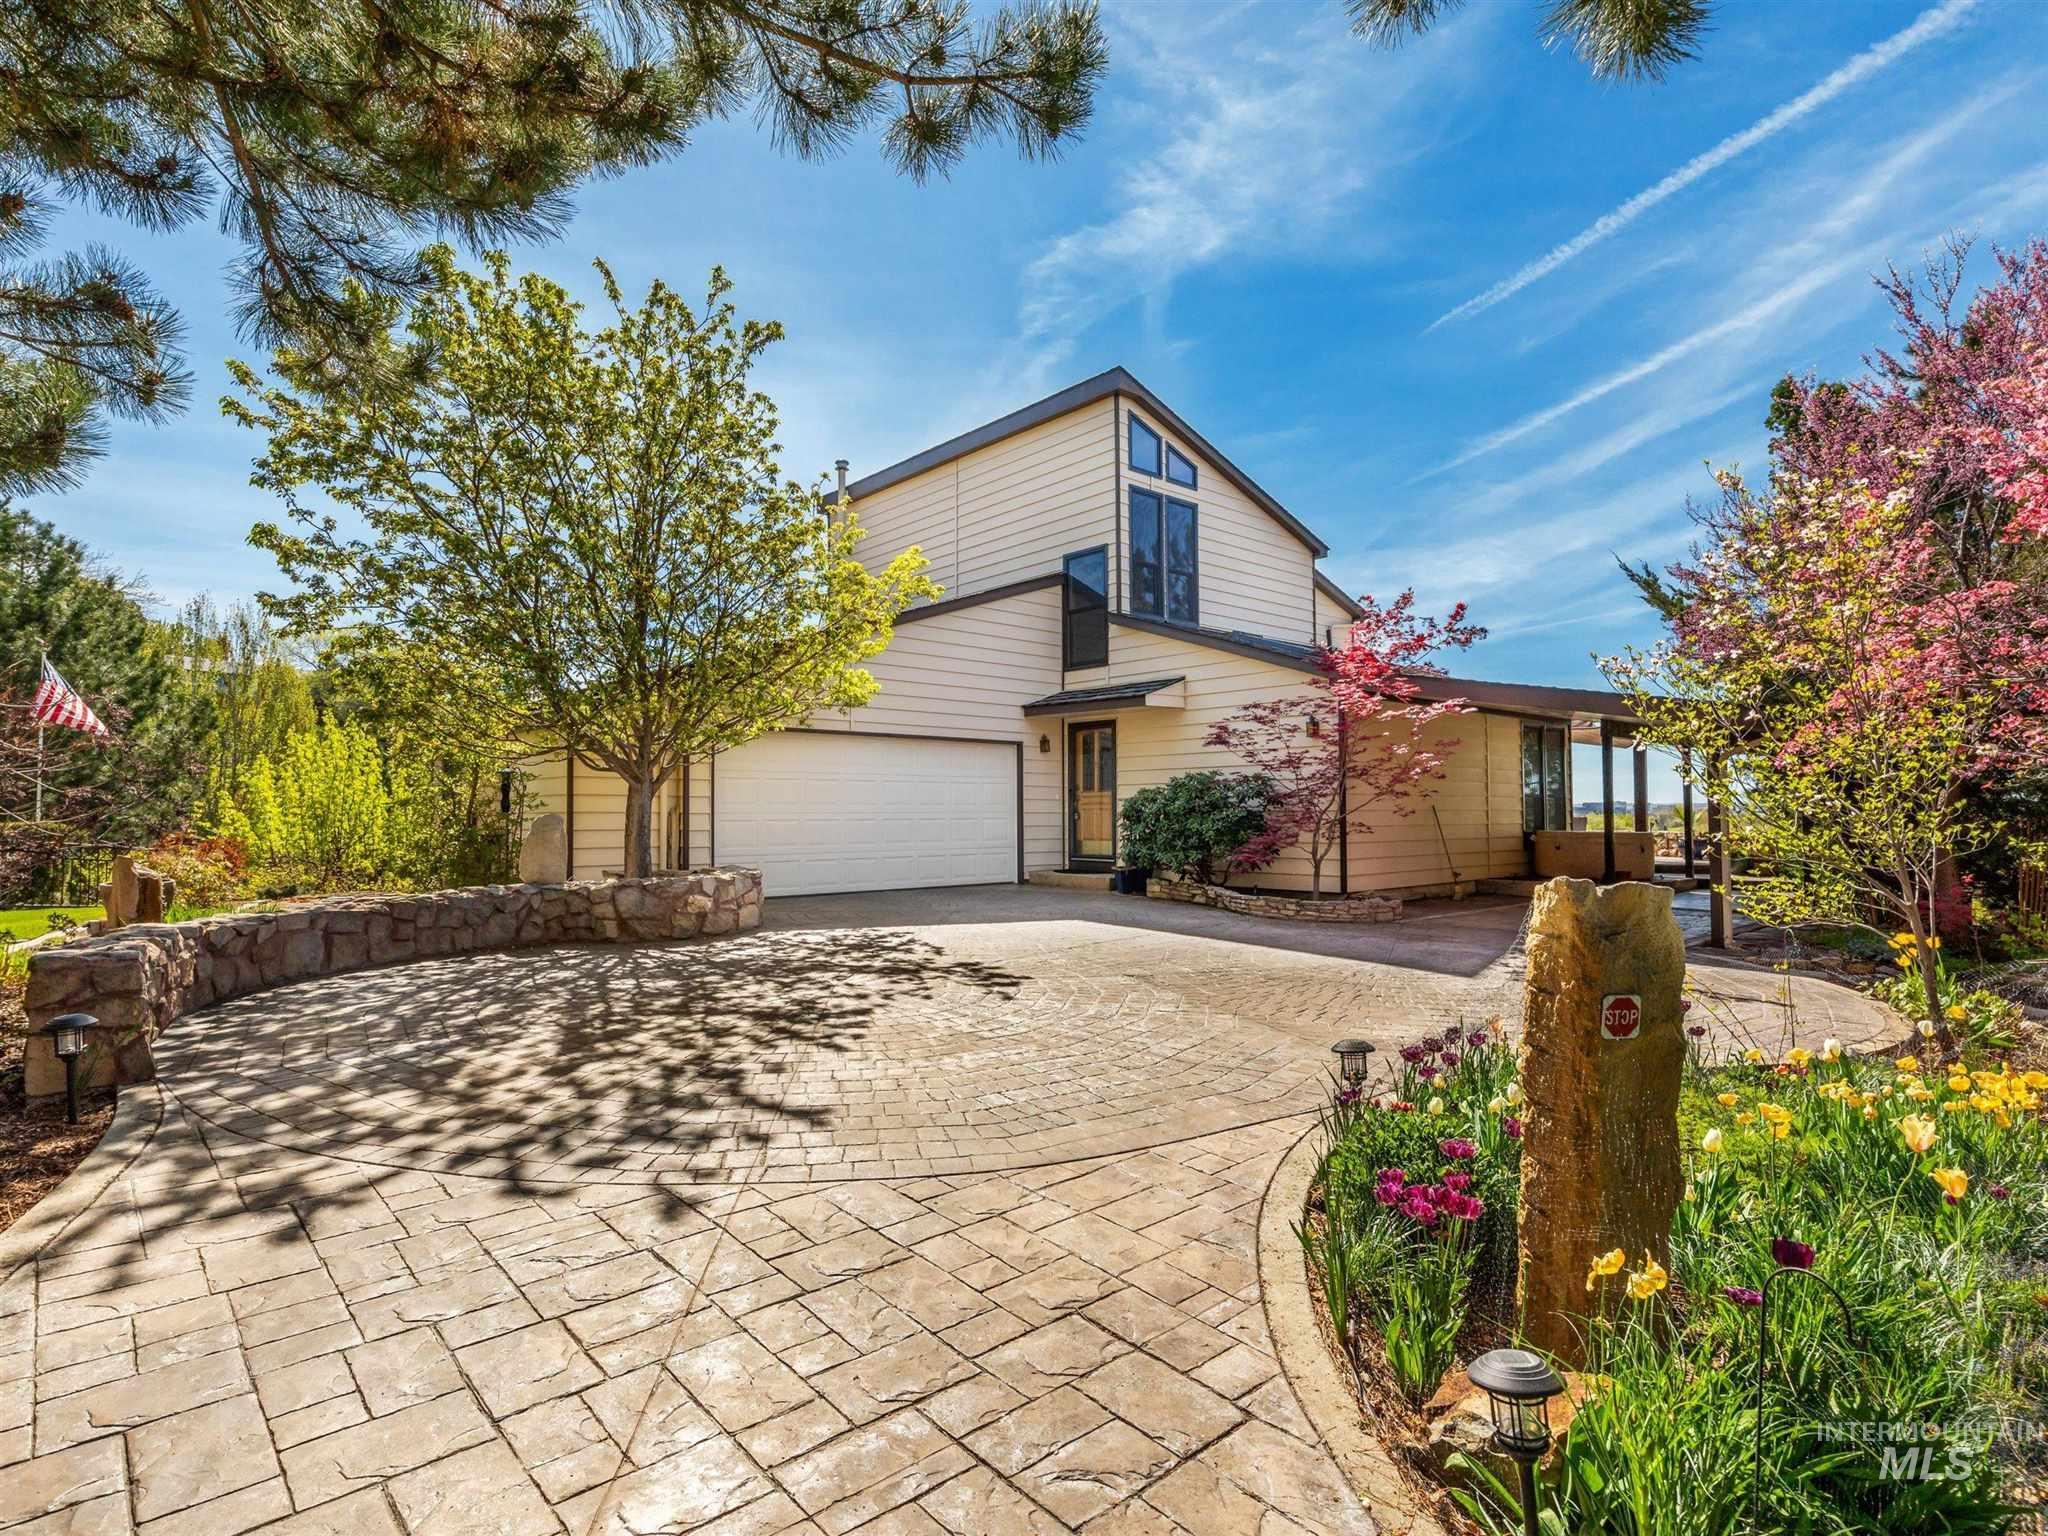 3029 N 24th Way Property Photo - Boise, ID real estate listing